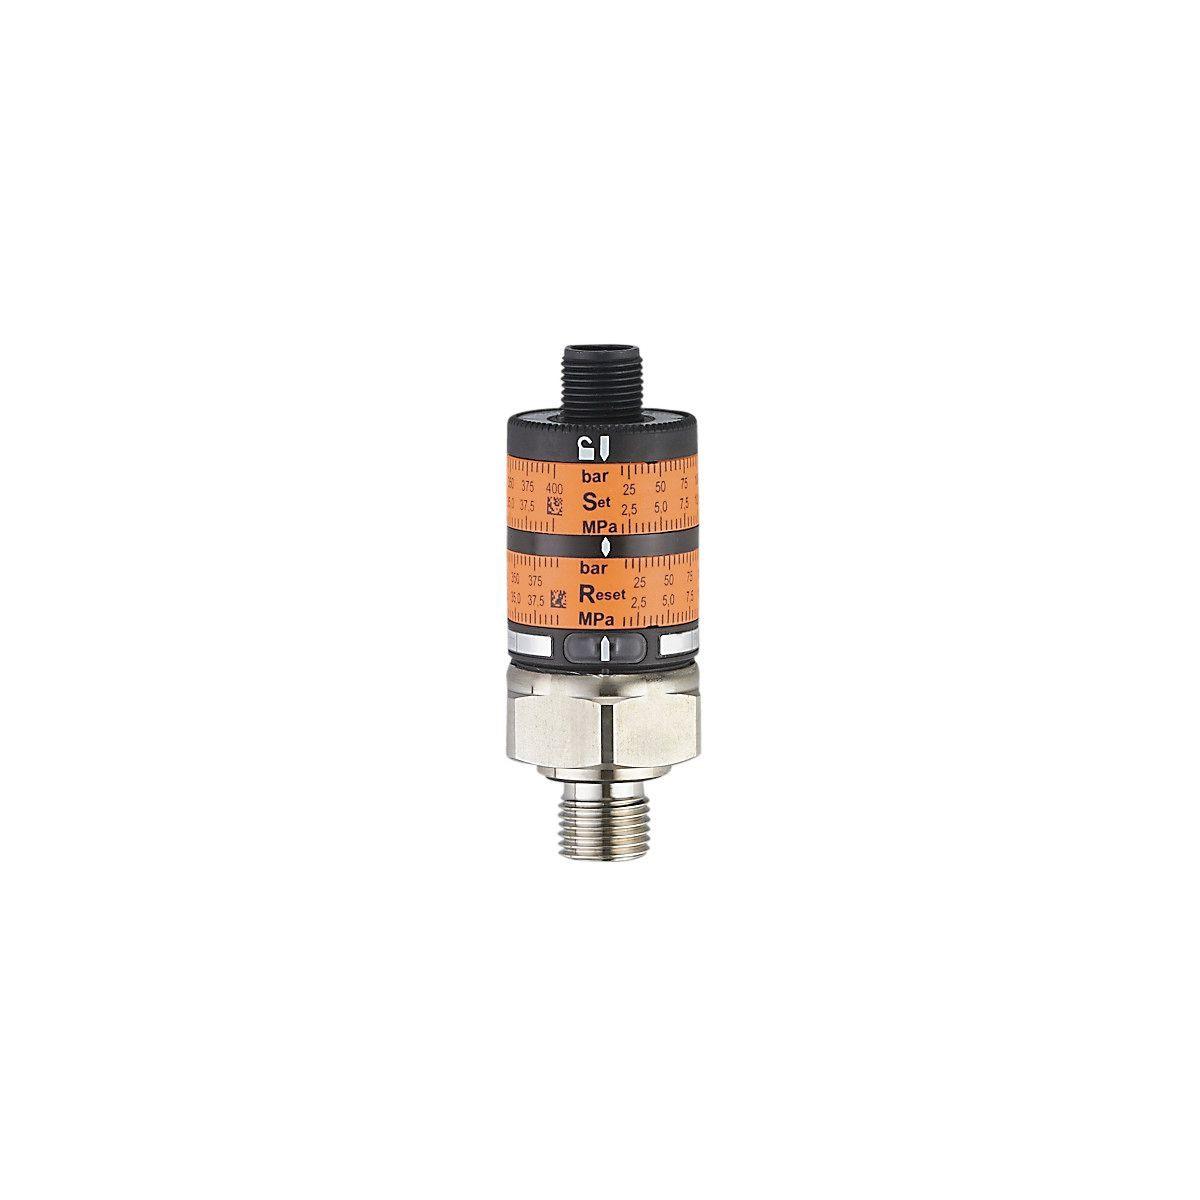 Ifm PK6534 PK-010-RFG14-HCPKG/US/ /W Pressure Sensor